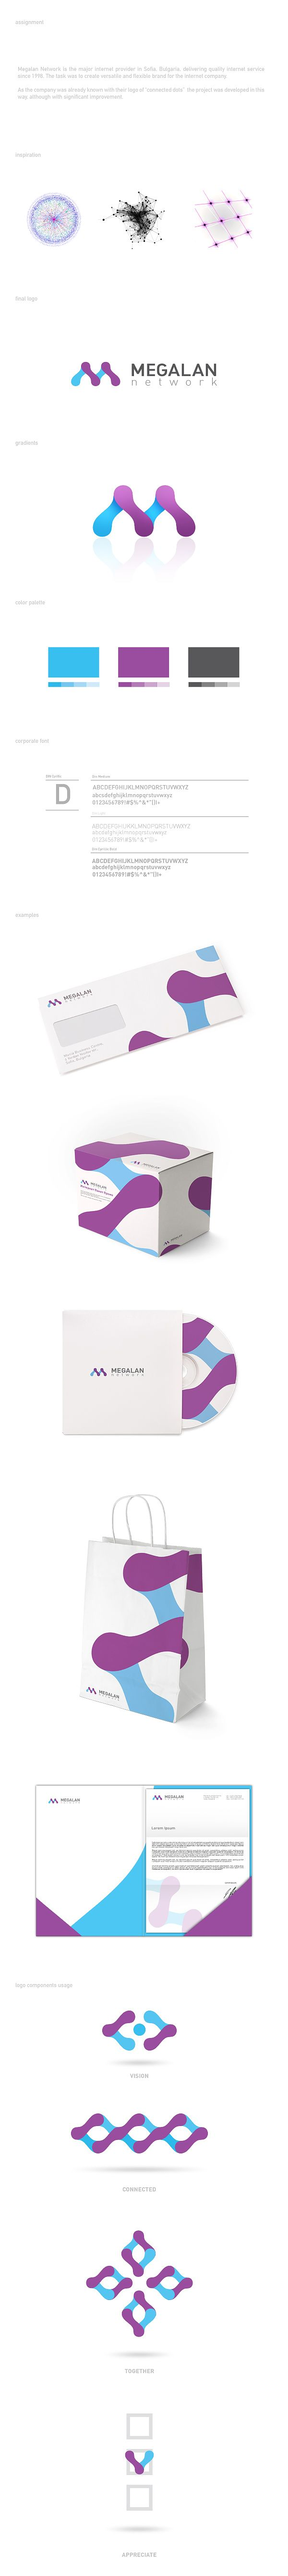 Megalan Network - internet provider - versatile & flexible brand.